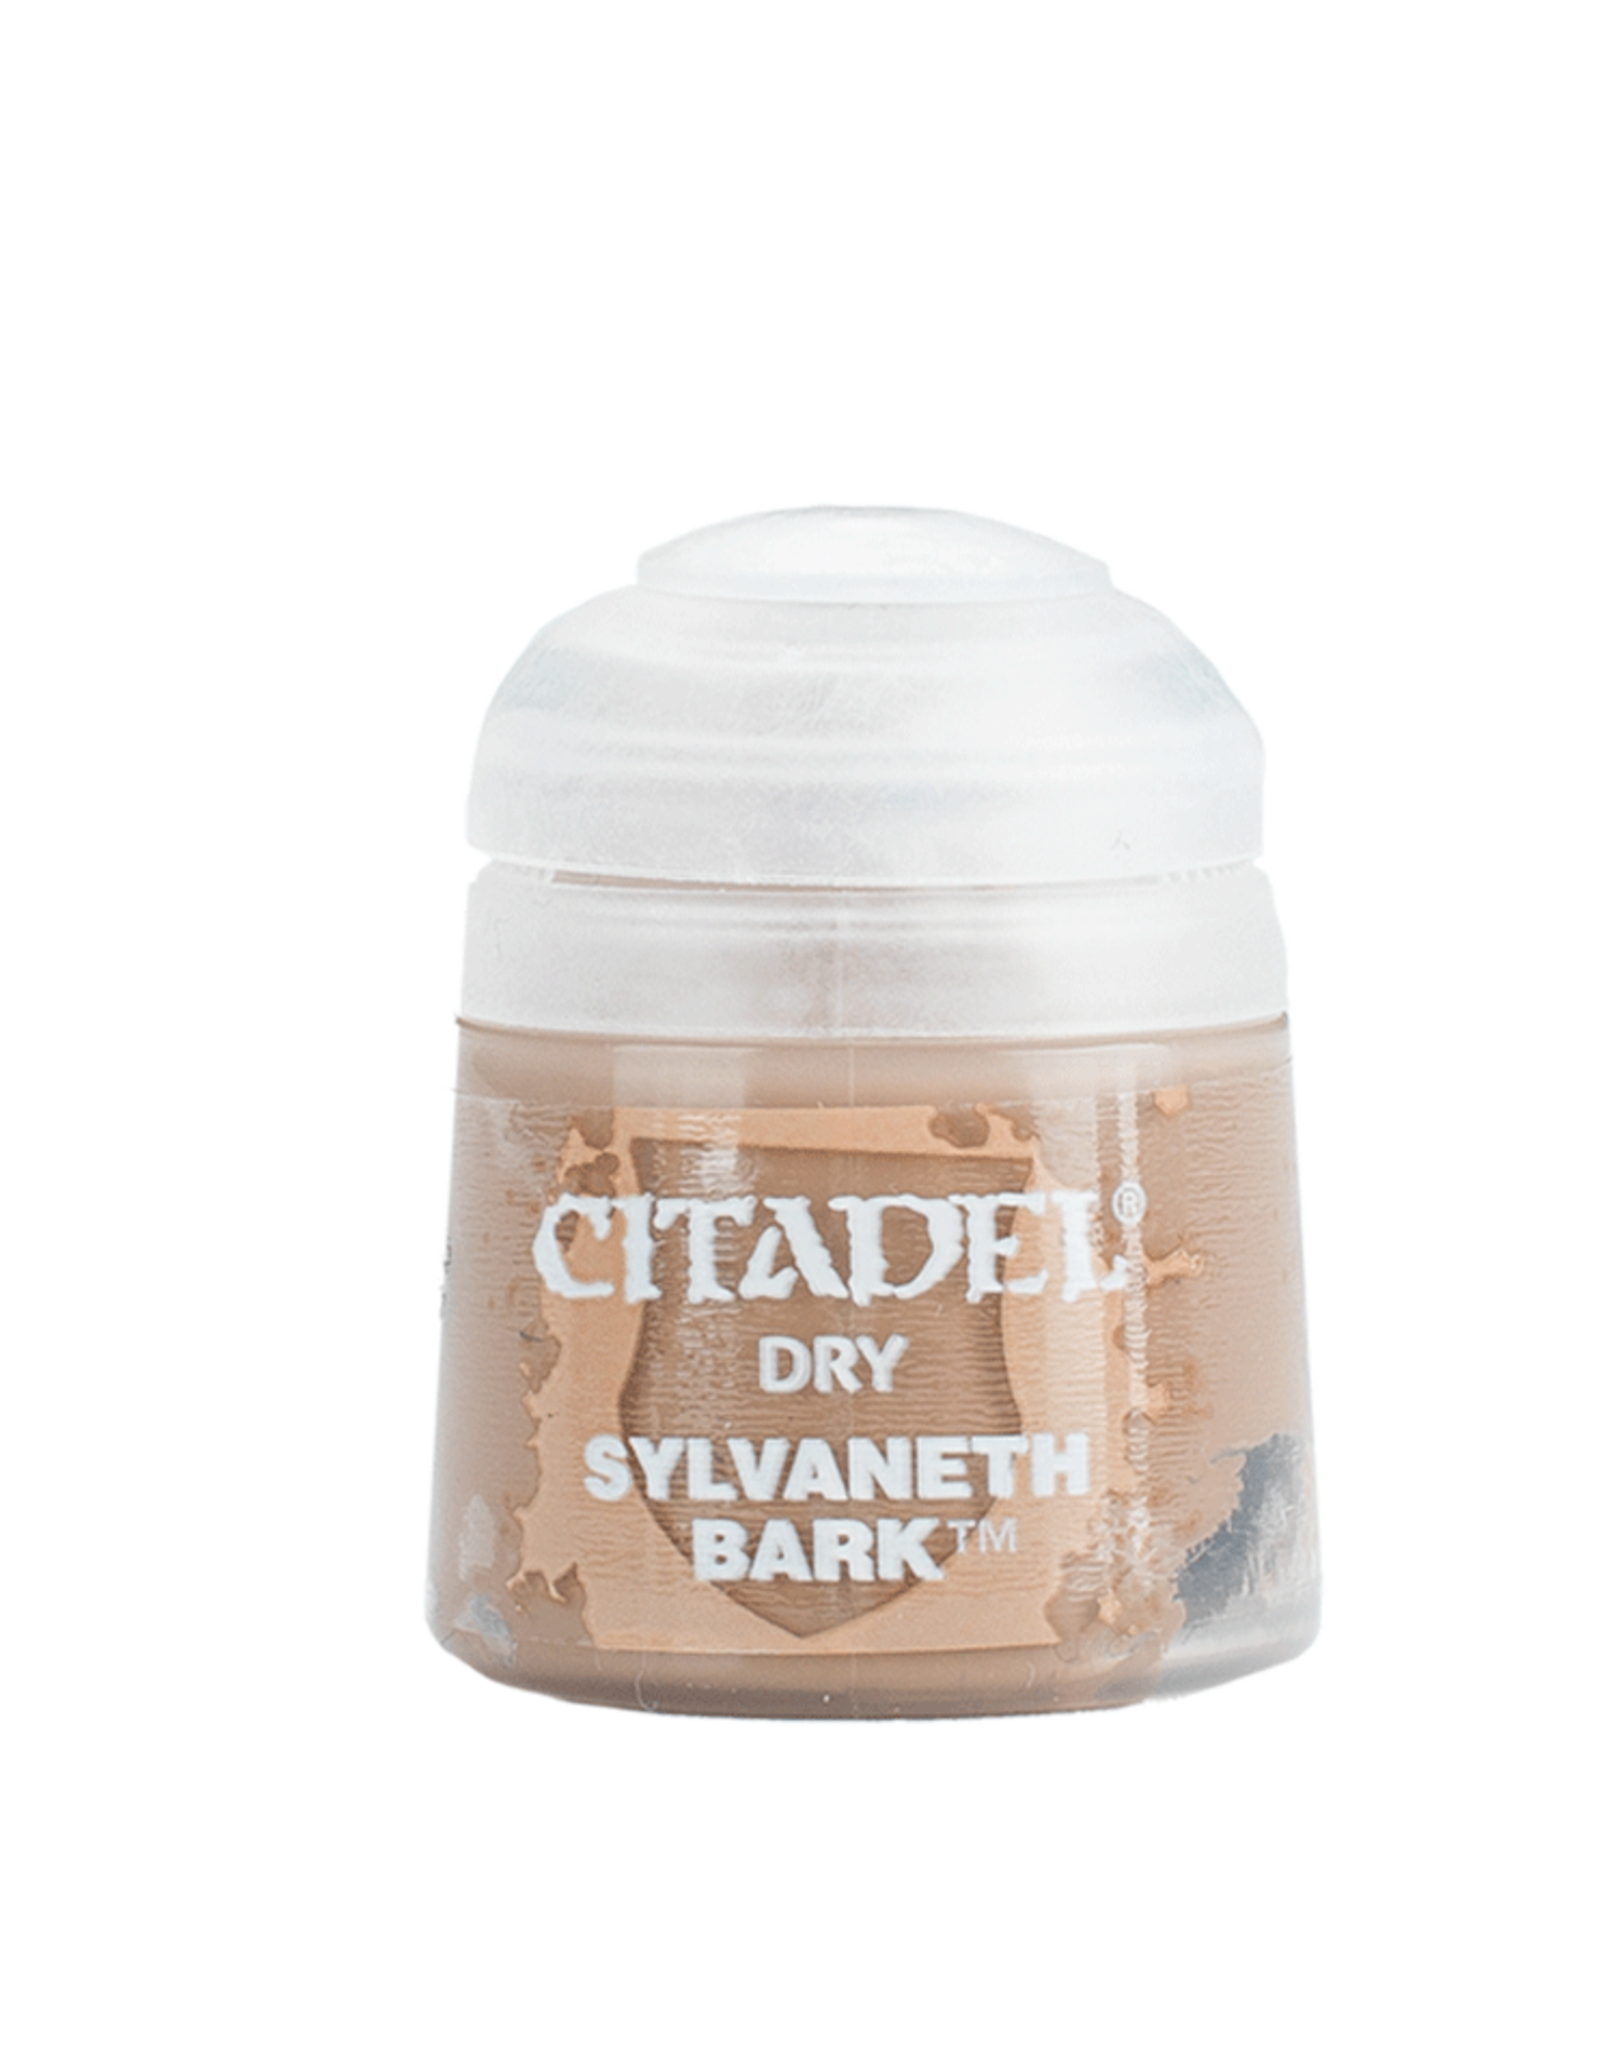 Citadel Citadel Dry: Sylvaneth Bark (12ml)